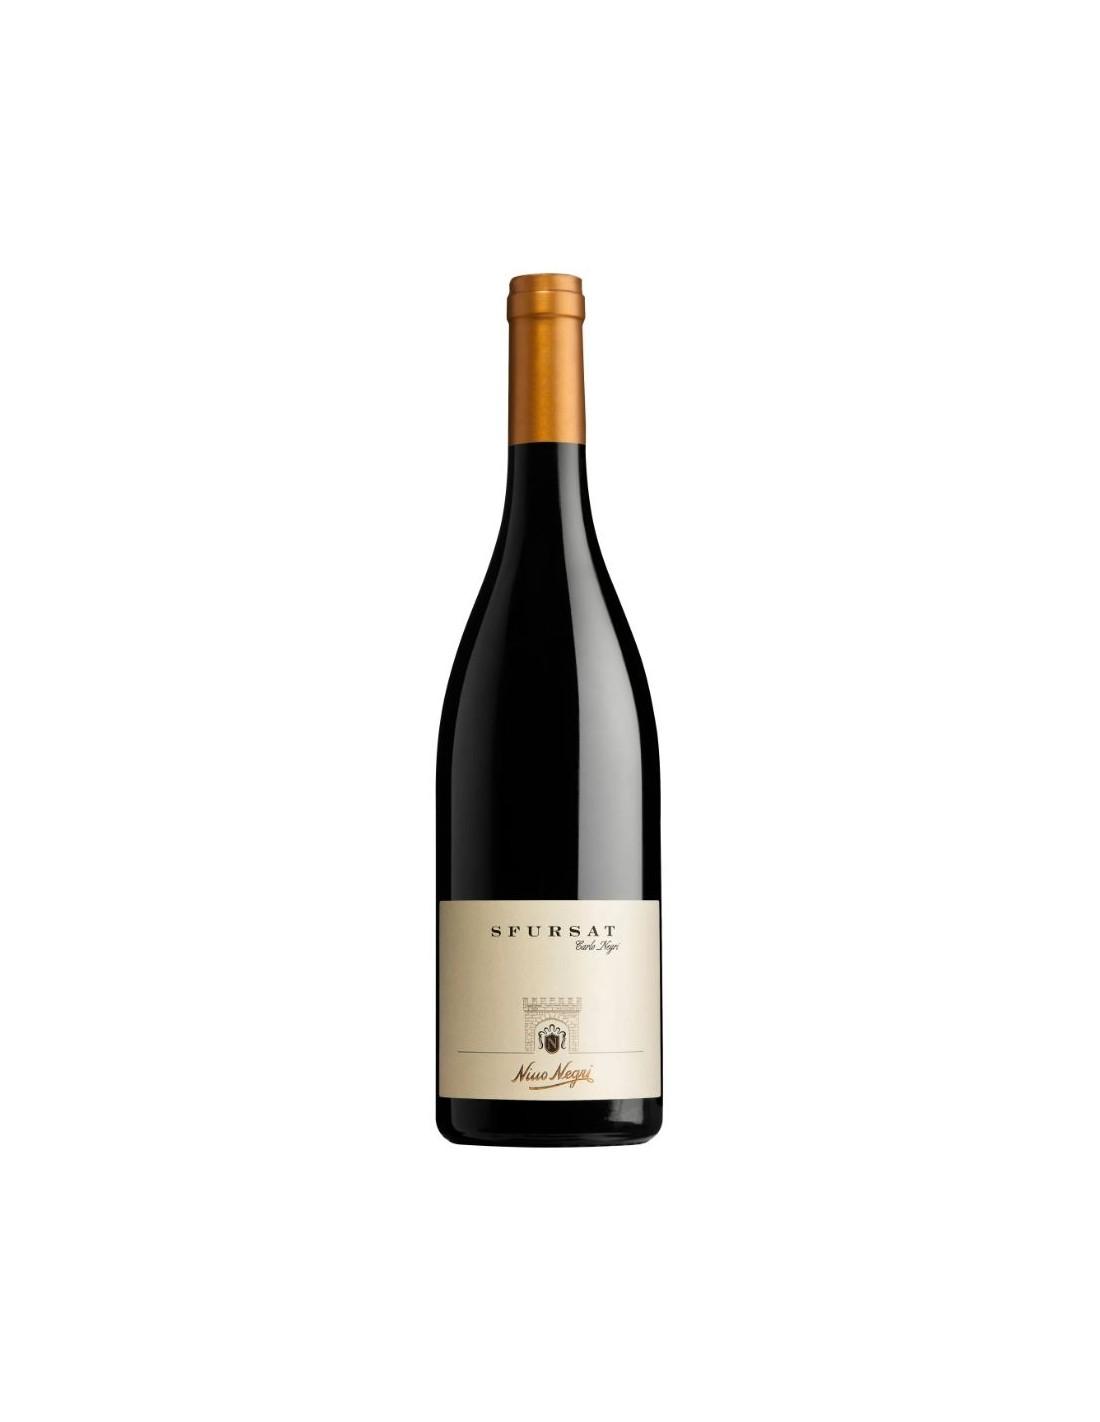 Vin rosu, Nebbiolo, Sfursat 'Carlo Negri' Valtellina, 0.75L, 15% alc., Italia